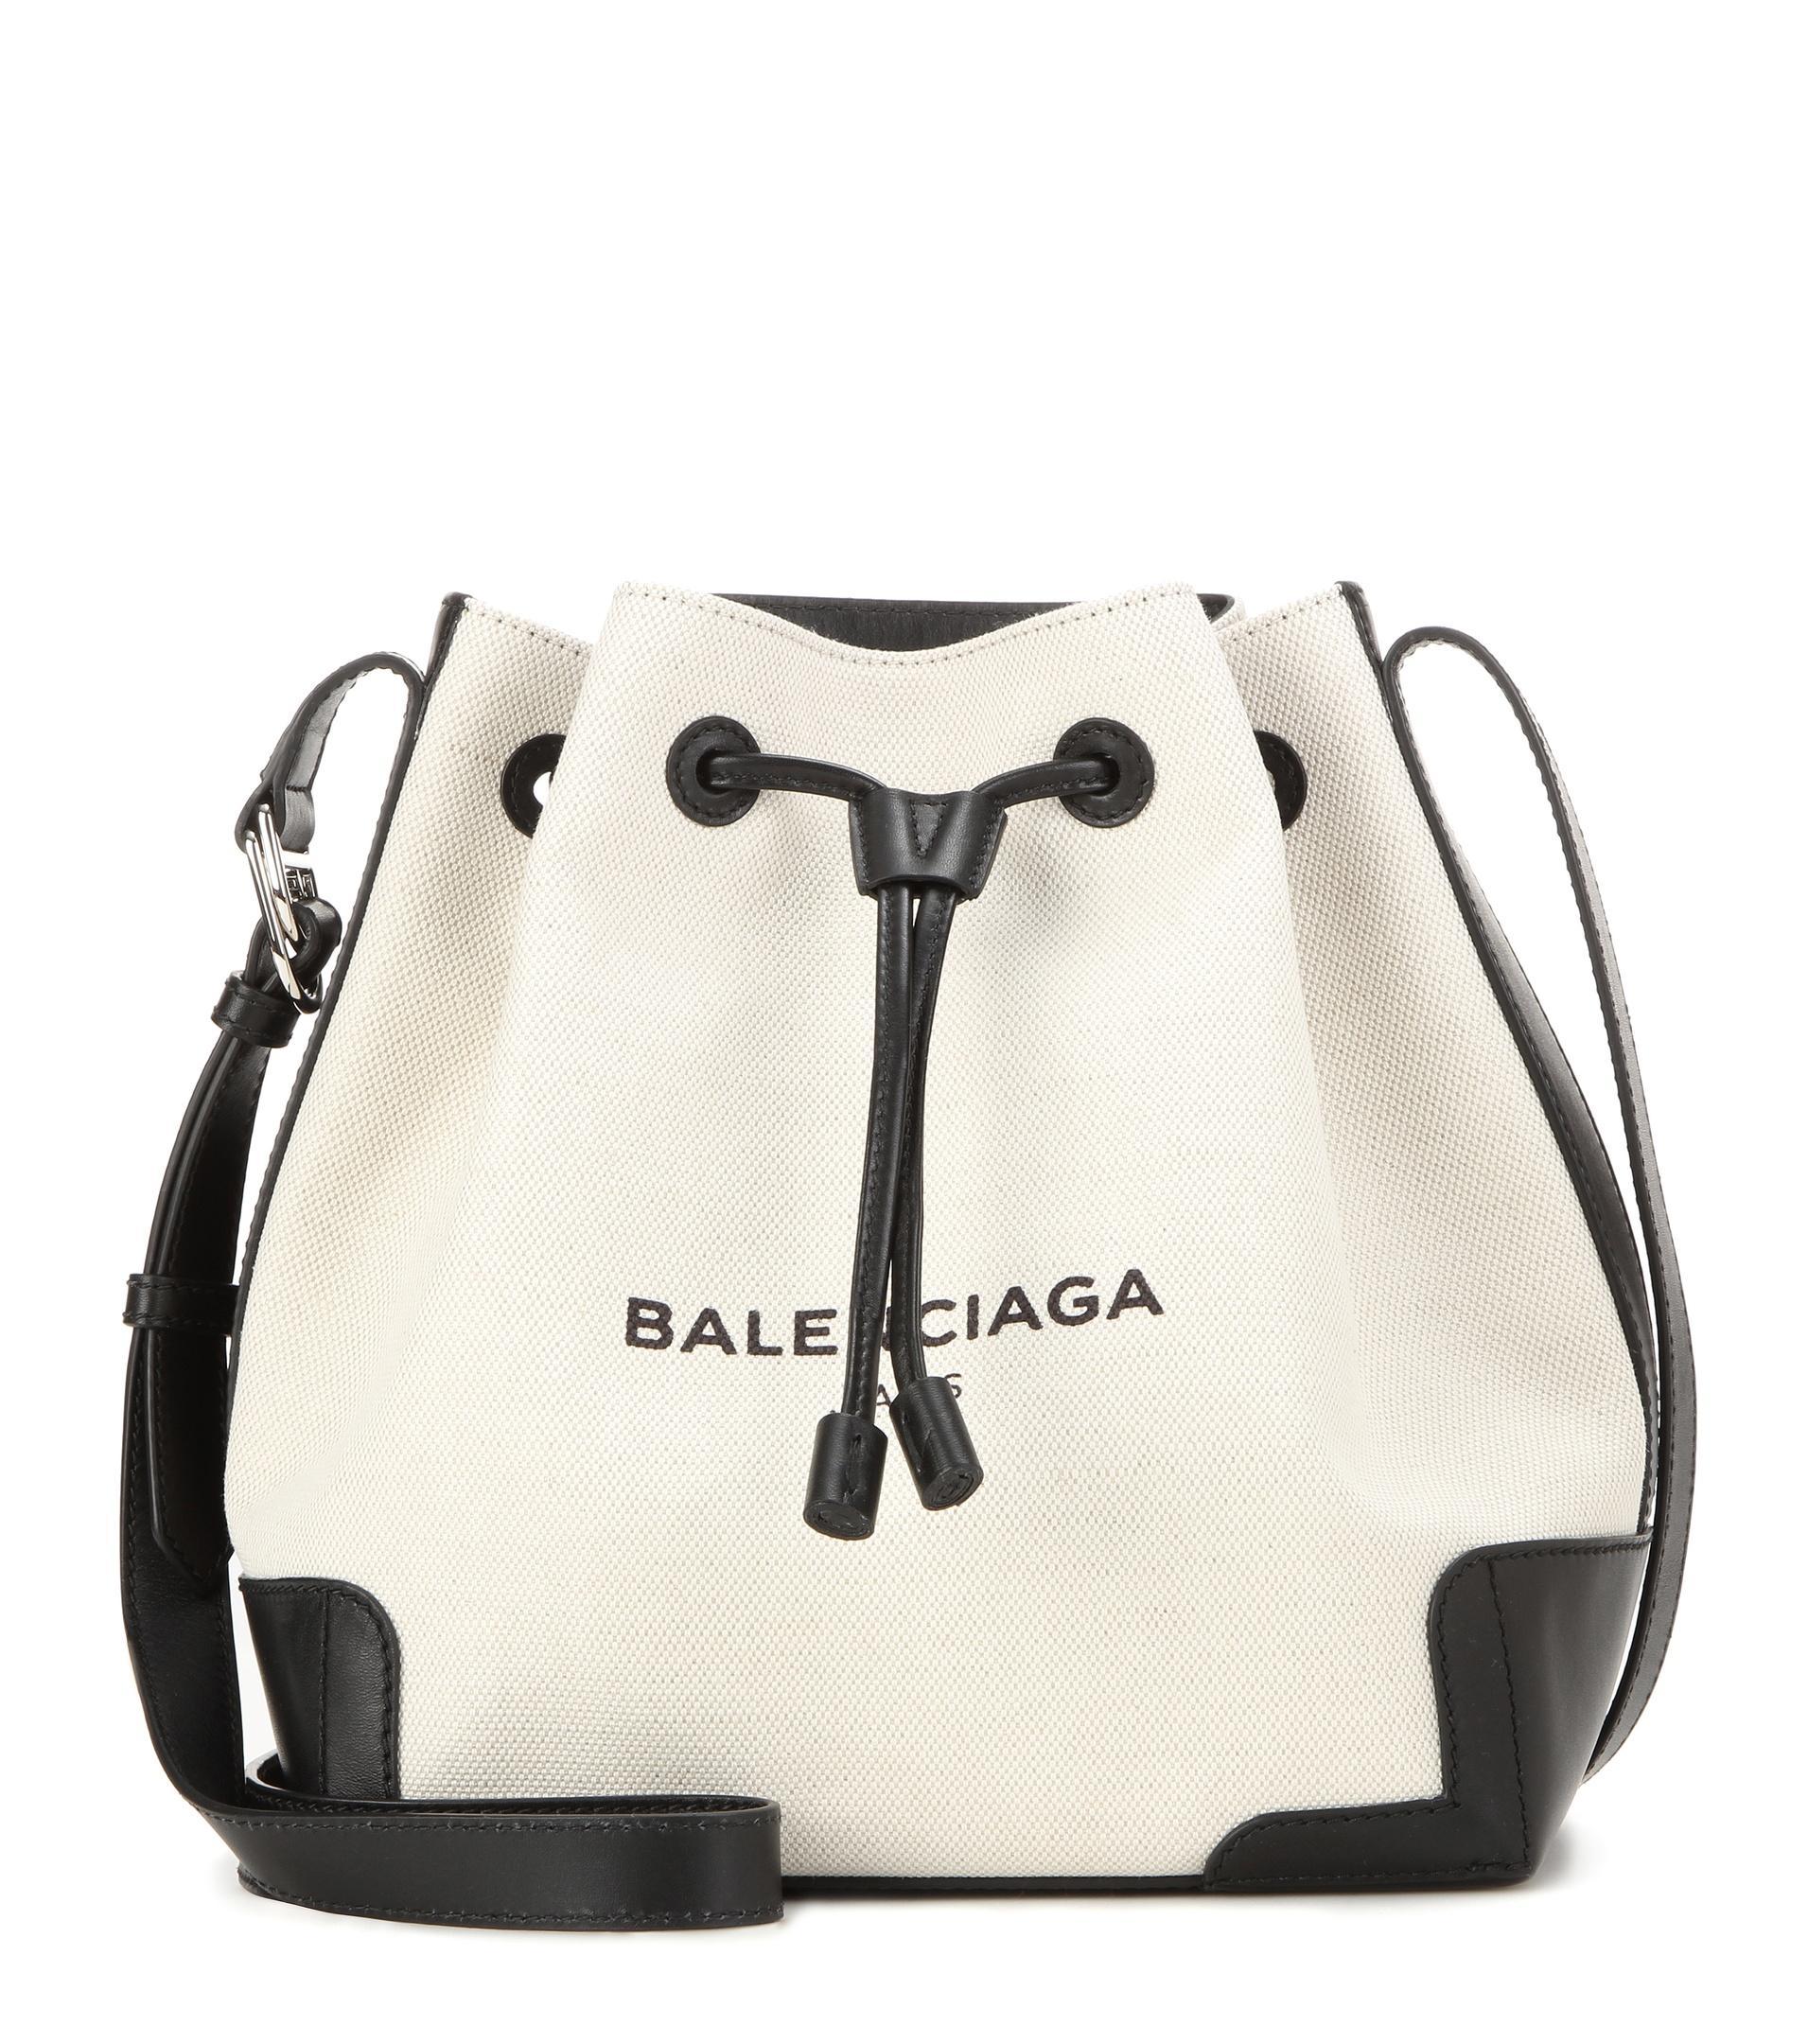 Balenciaga Bucket Leather Trimmed Canvas Shoulder Bag In Black Beige Black Lyst